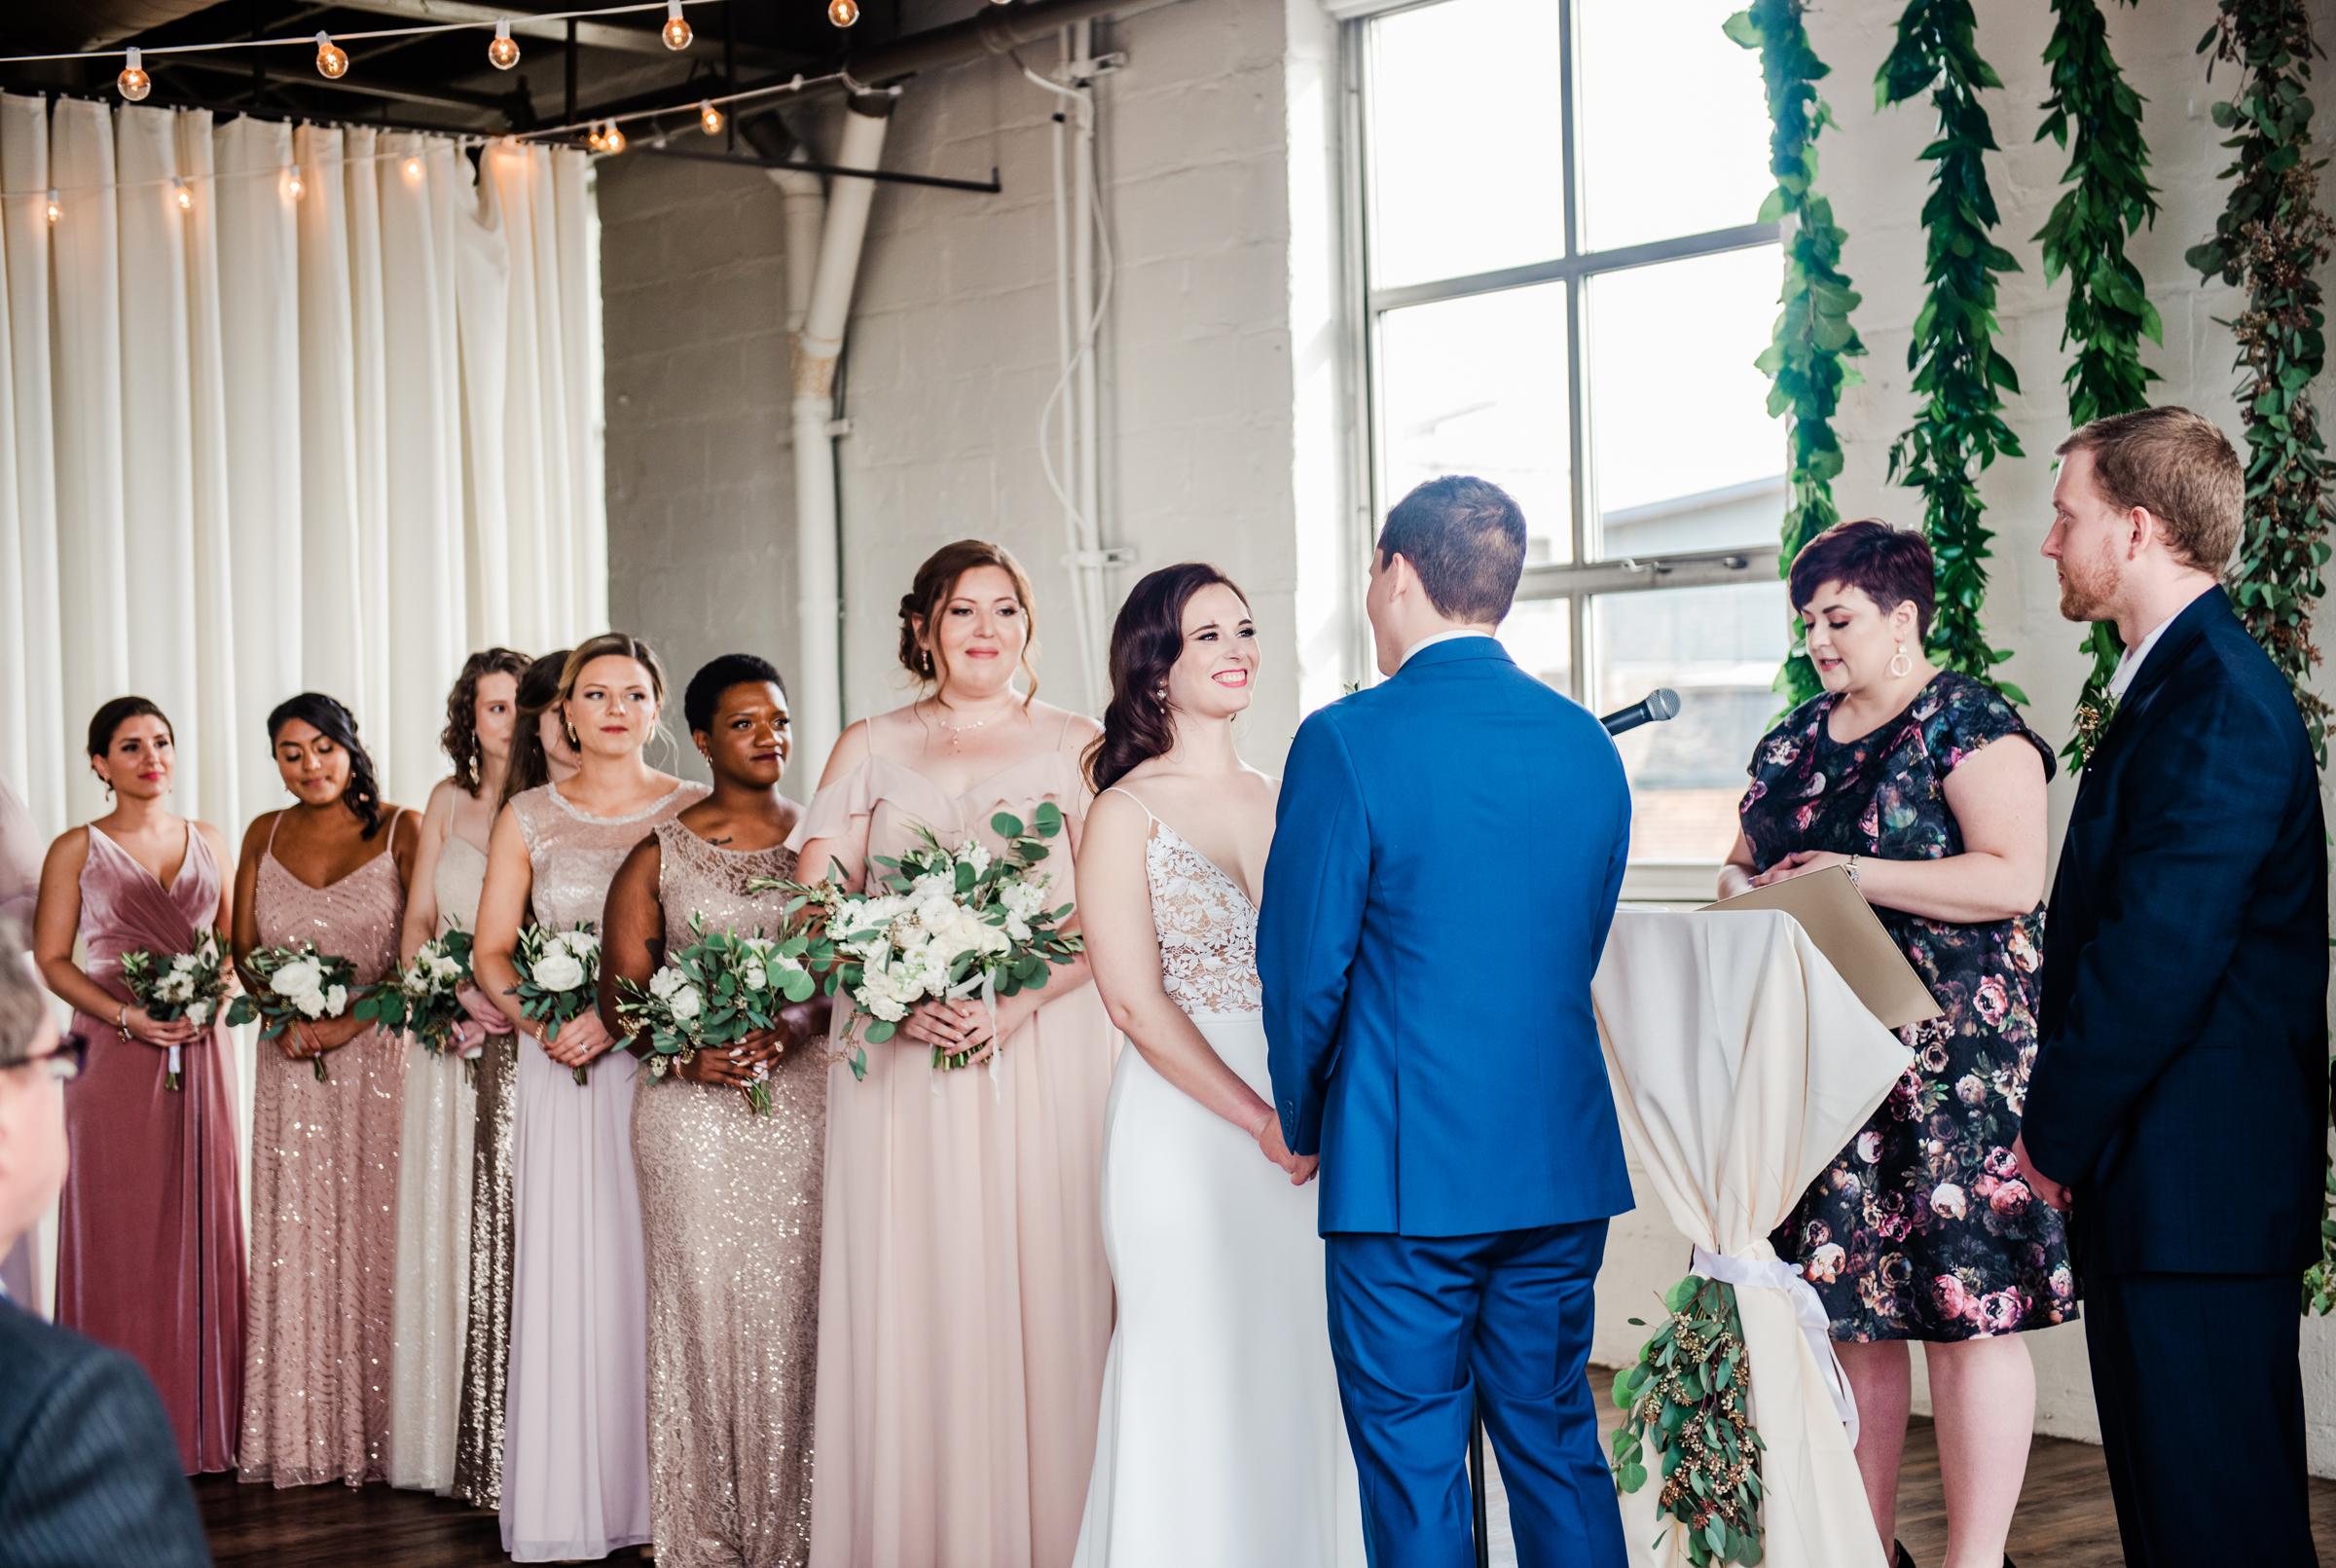 The_Arbor_LoftRochester_Wedding_JILL_STUDIO_Rochester_NY_Photographer_170609.jpg